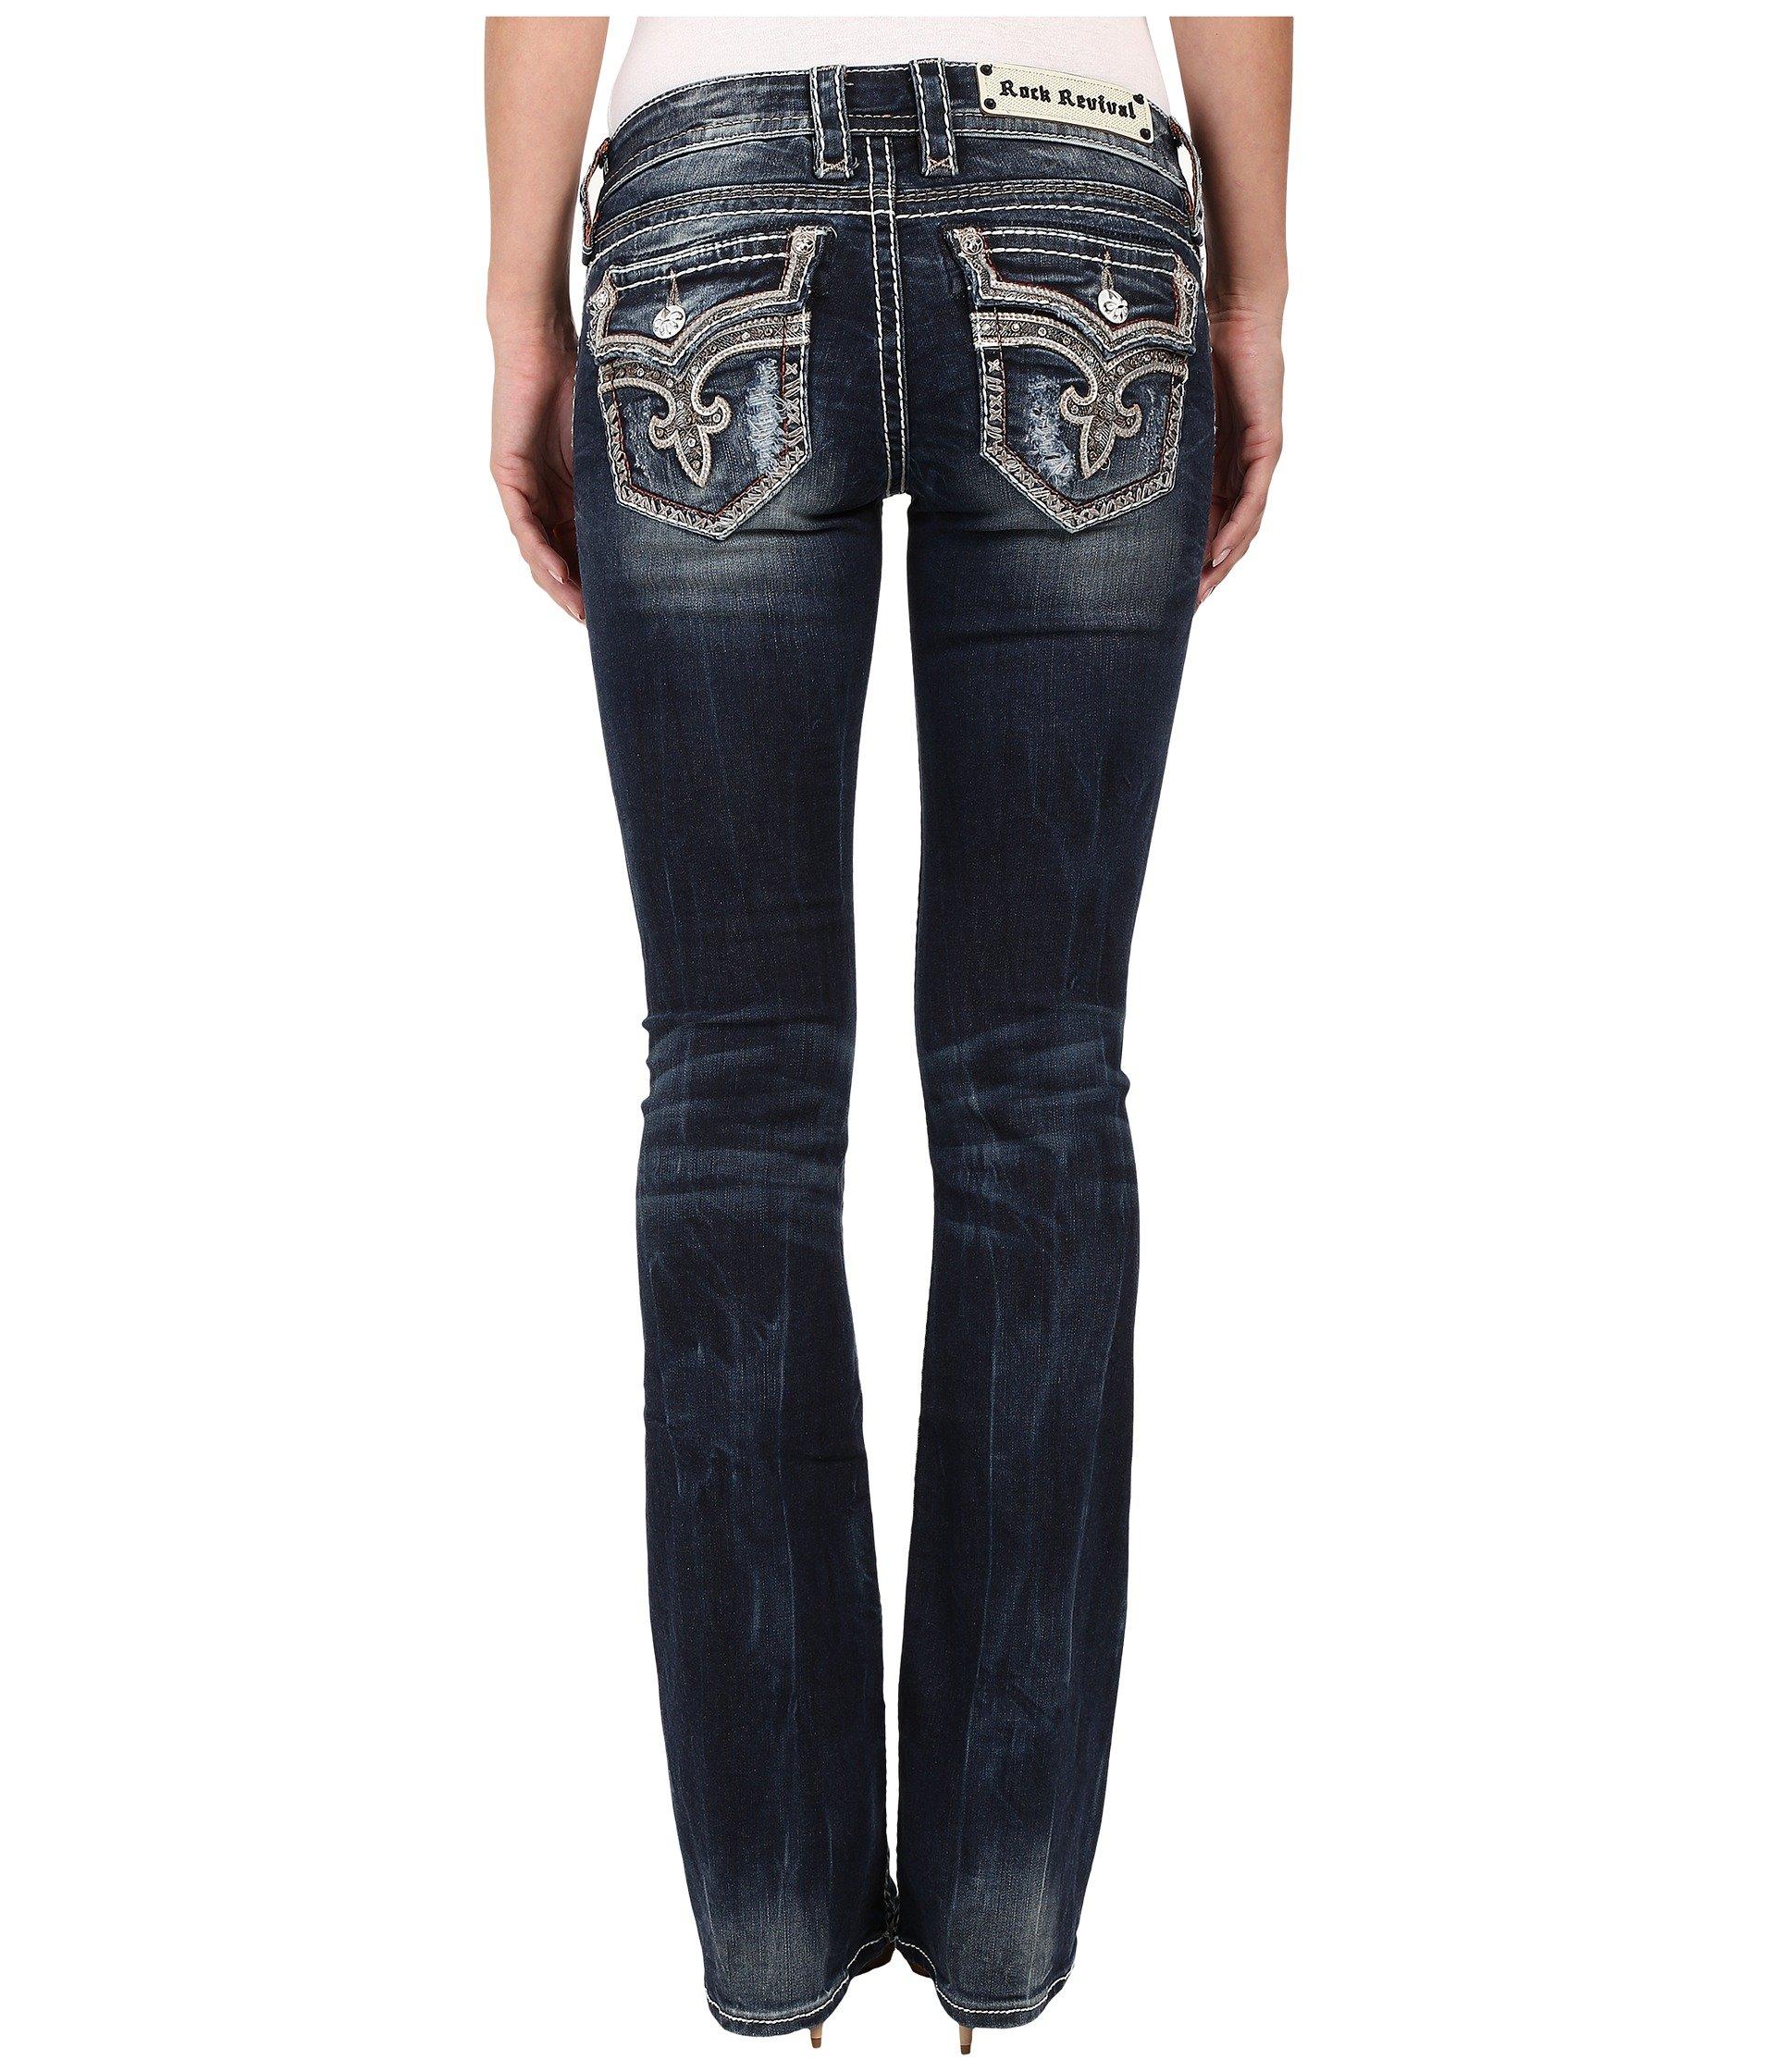 Rock Revival Women's Tibbie B2 Boot Dark Blue Jeans